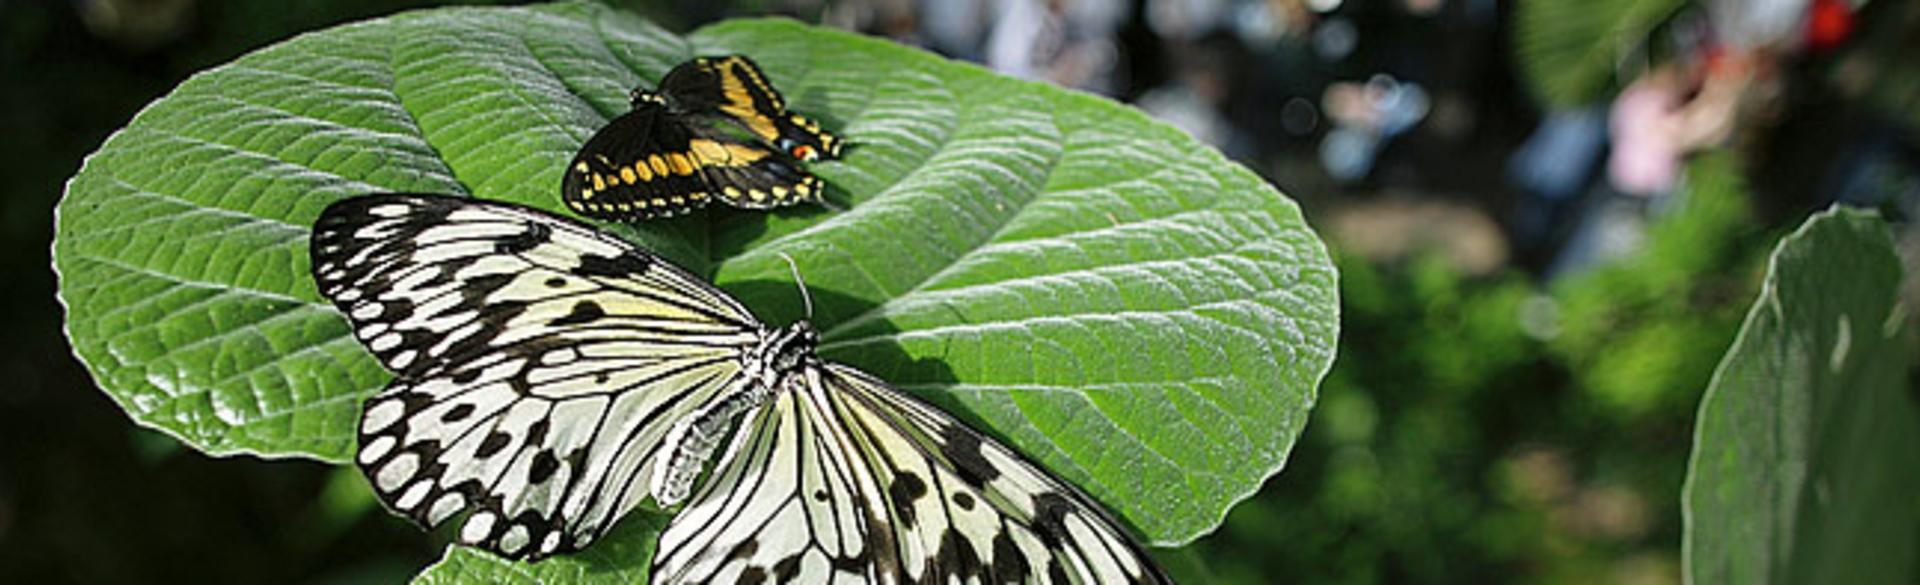 Frederik Meijer Gardens & Sculpture Park Butterflies